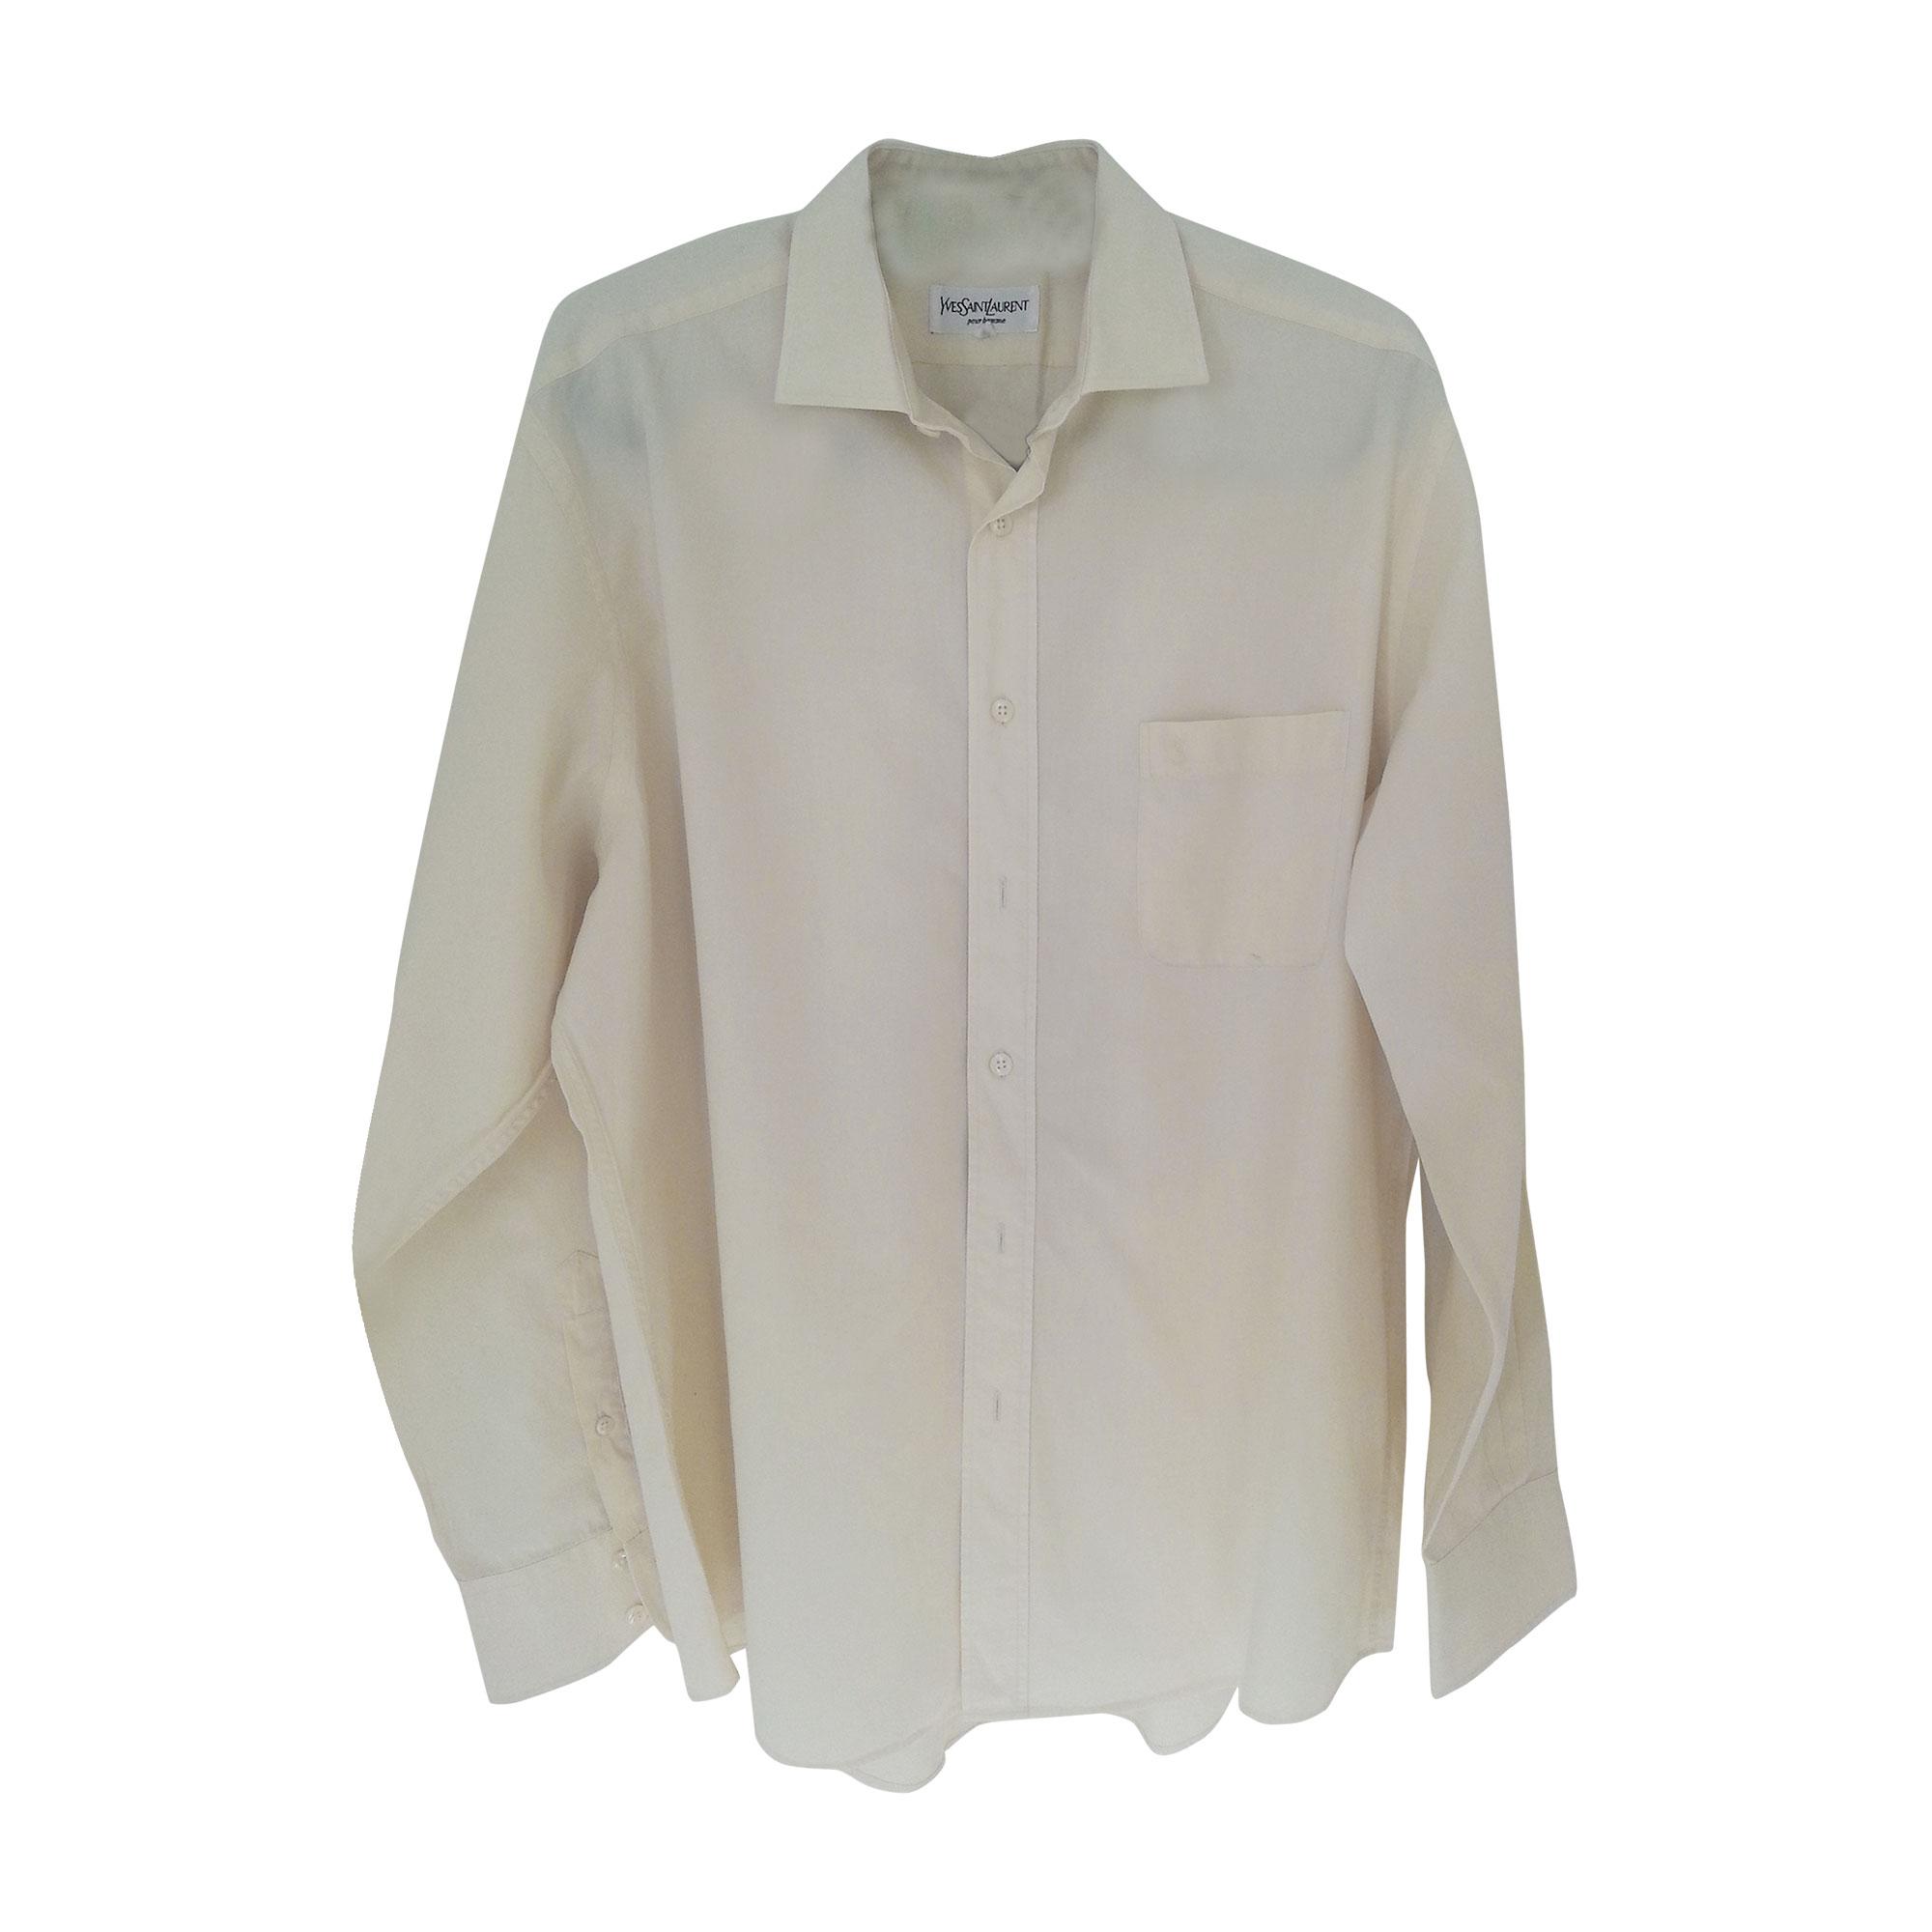 chemise yves saint laurent 41 42 l blanc 2490887. Black Bedroom Furniture Sets. Home Design Ideas